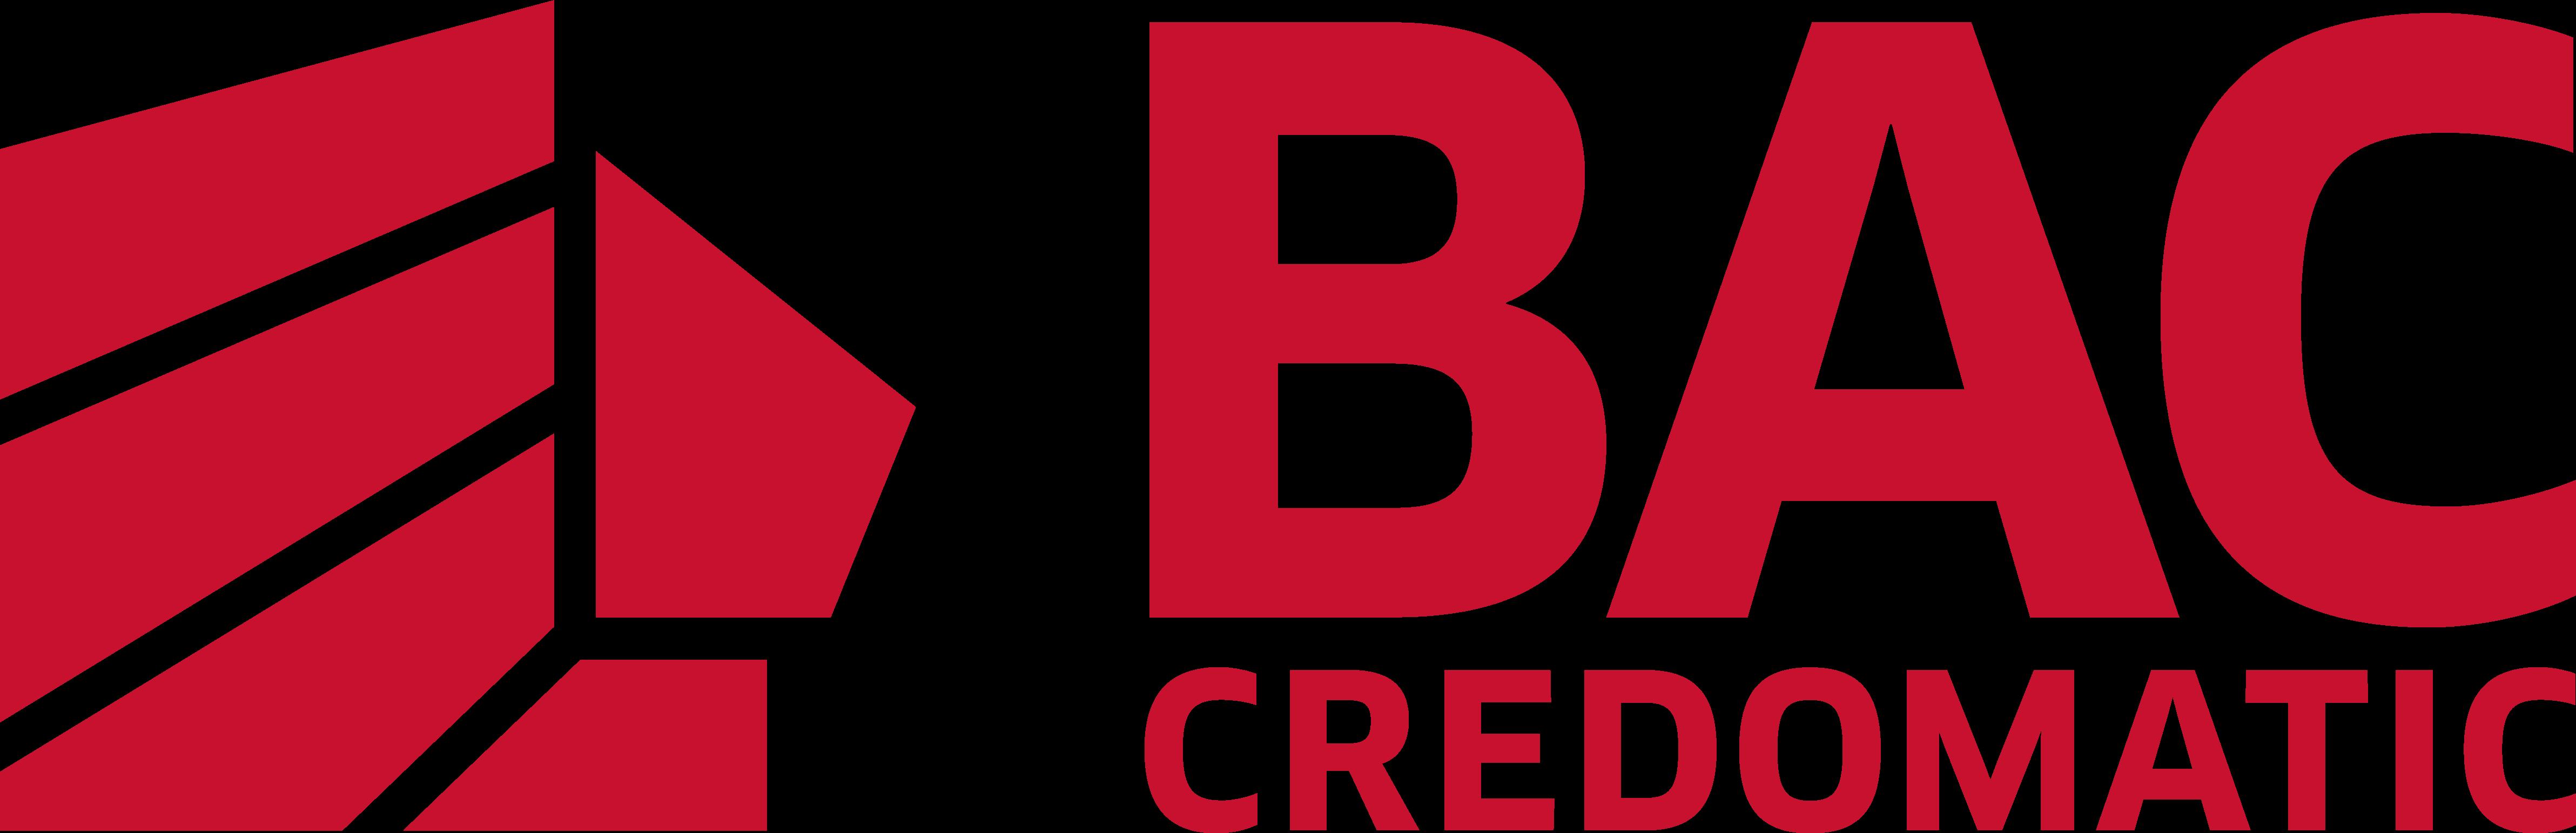 bacredomatic_logo